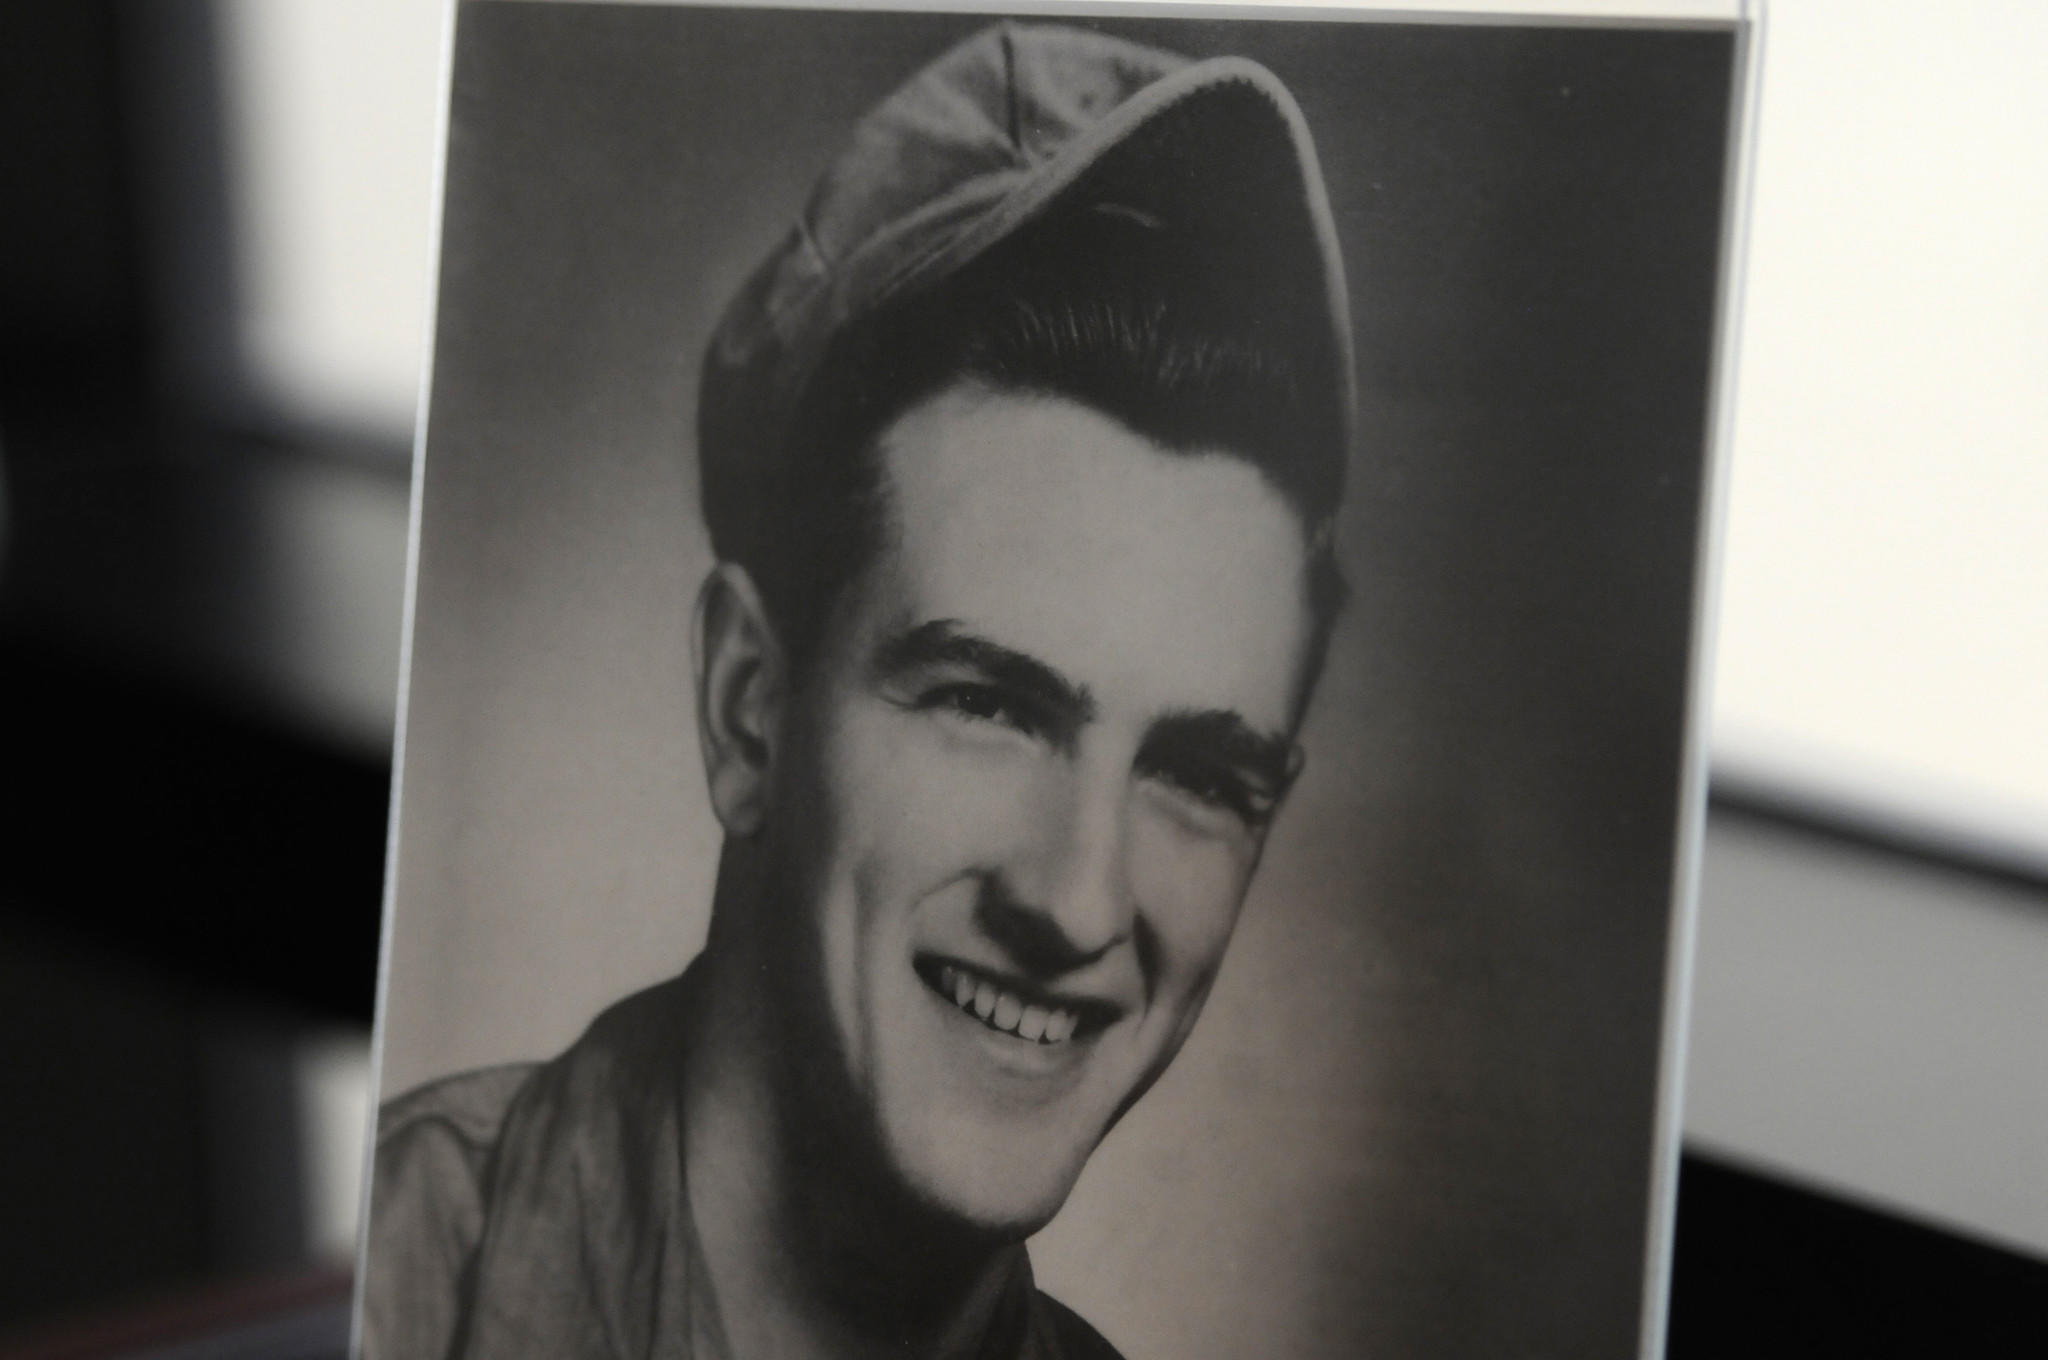 Mathew Caruso was killed in Korea on Dec. 6, 1950.